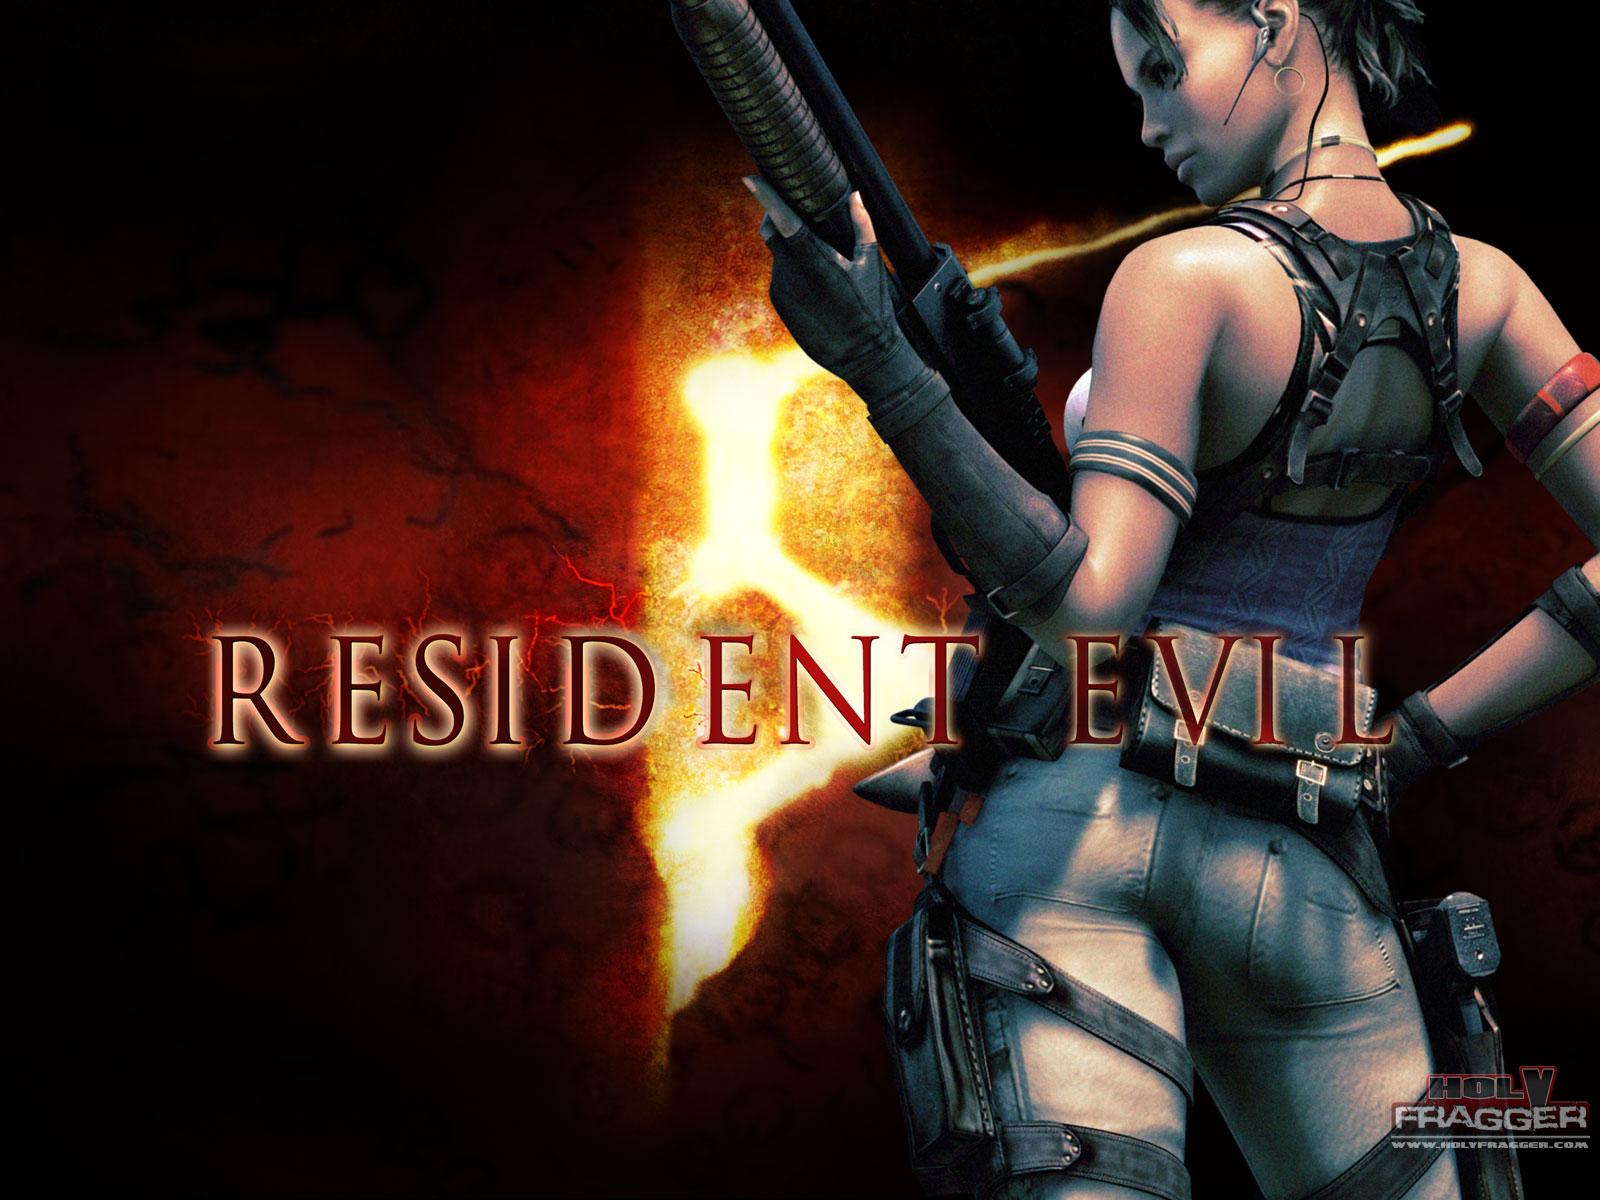 Nerdy Girl Wallpaper Hd Free Download Resident Evil 5 Wallpaper